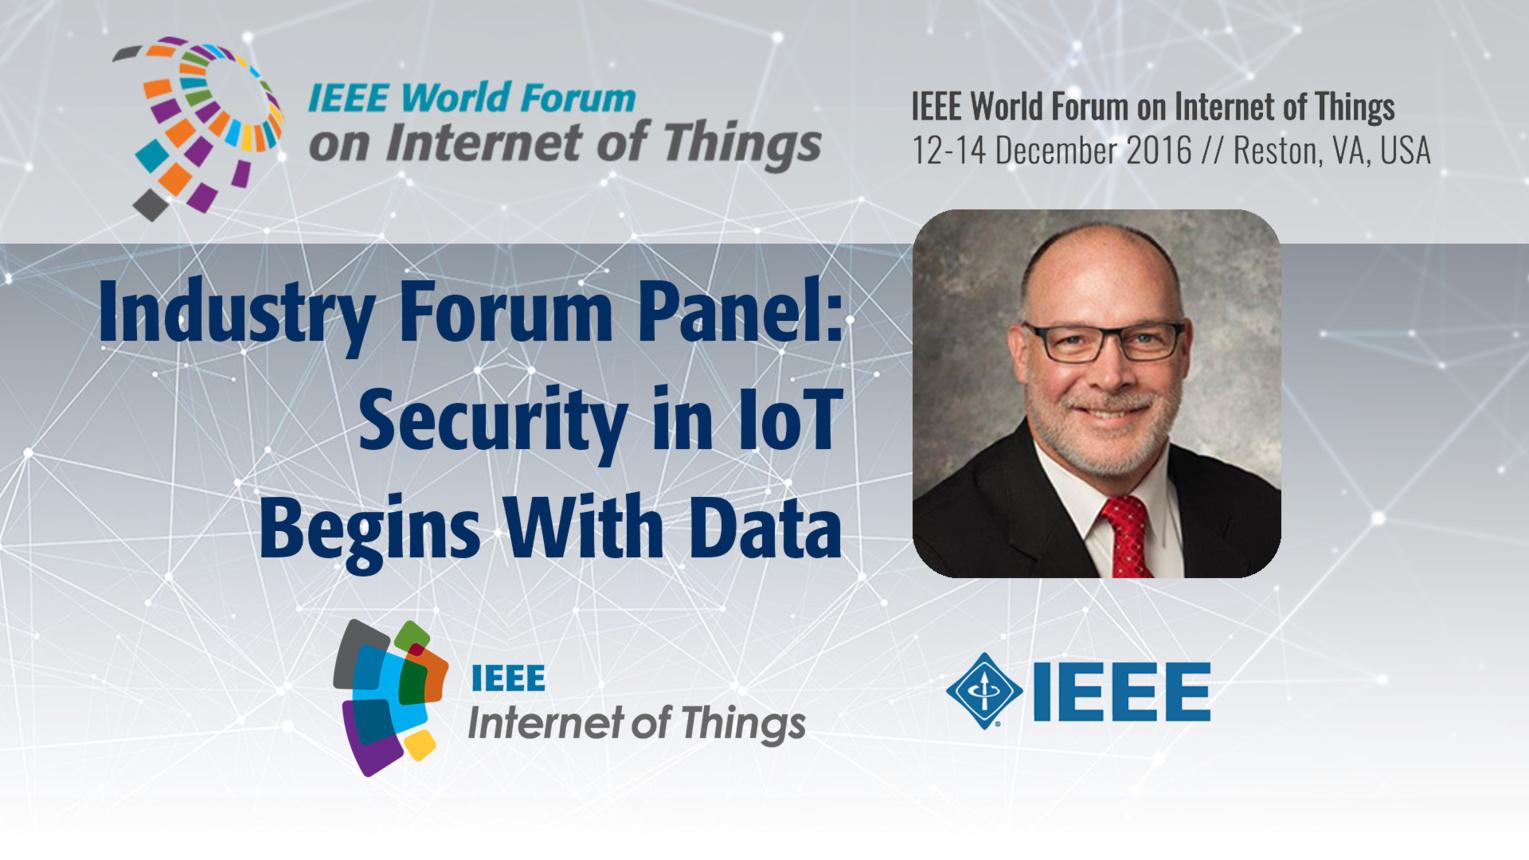 Daniel Engels: Security in IoT Begins With Data - Industry Forum Panel: WF IoT 2016